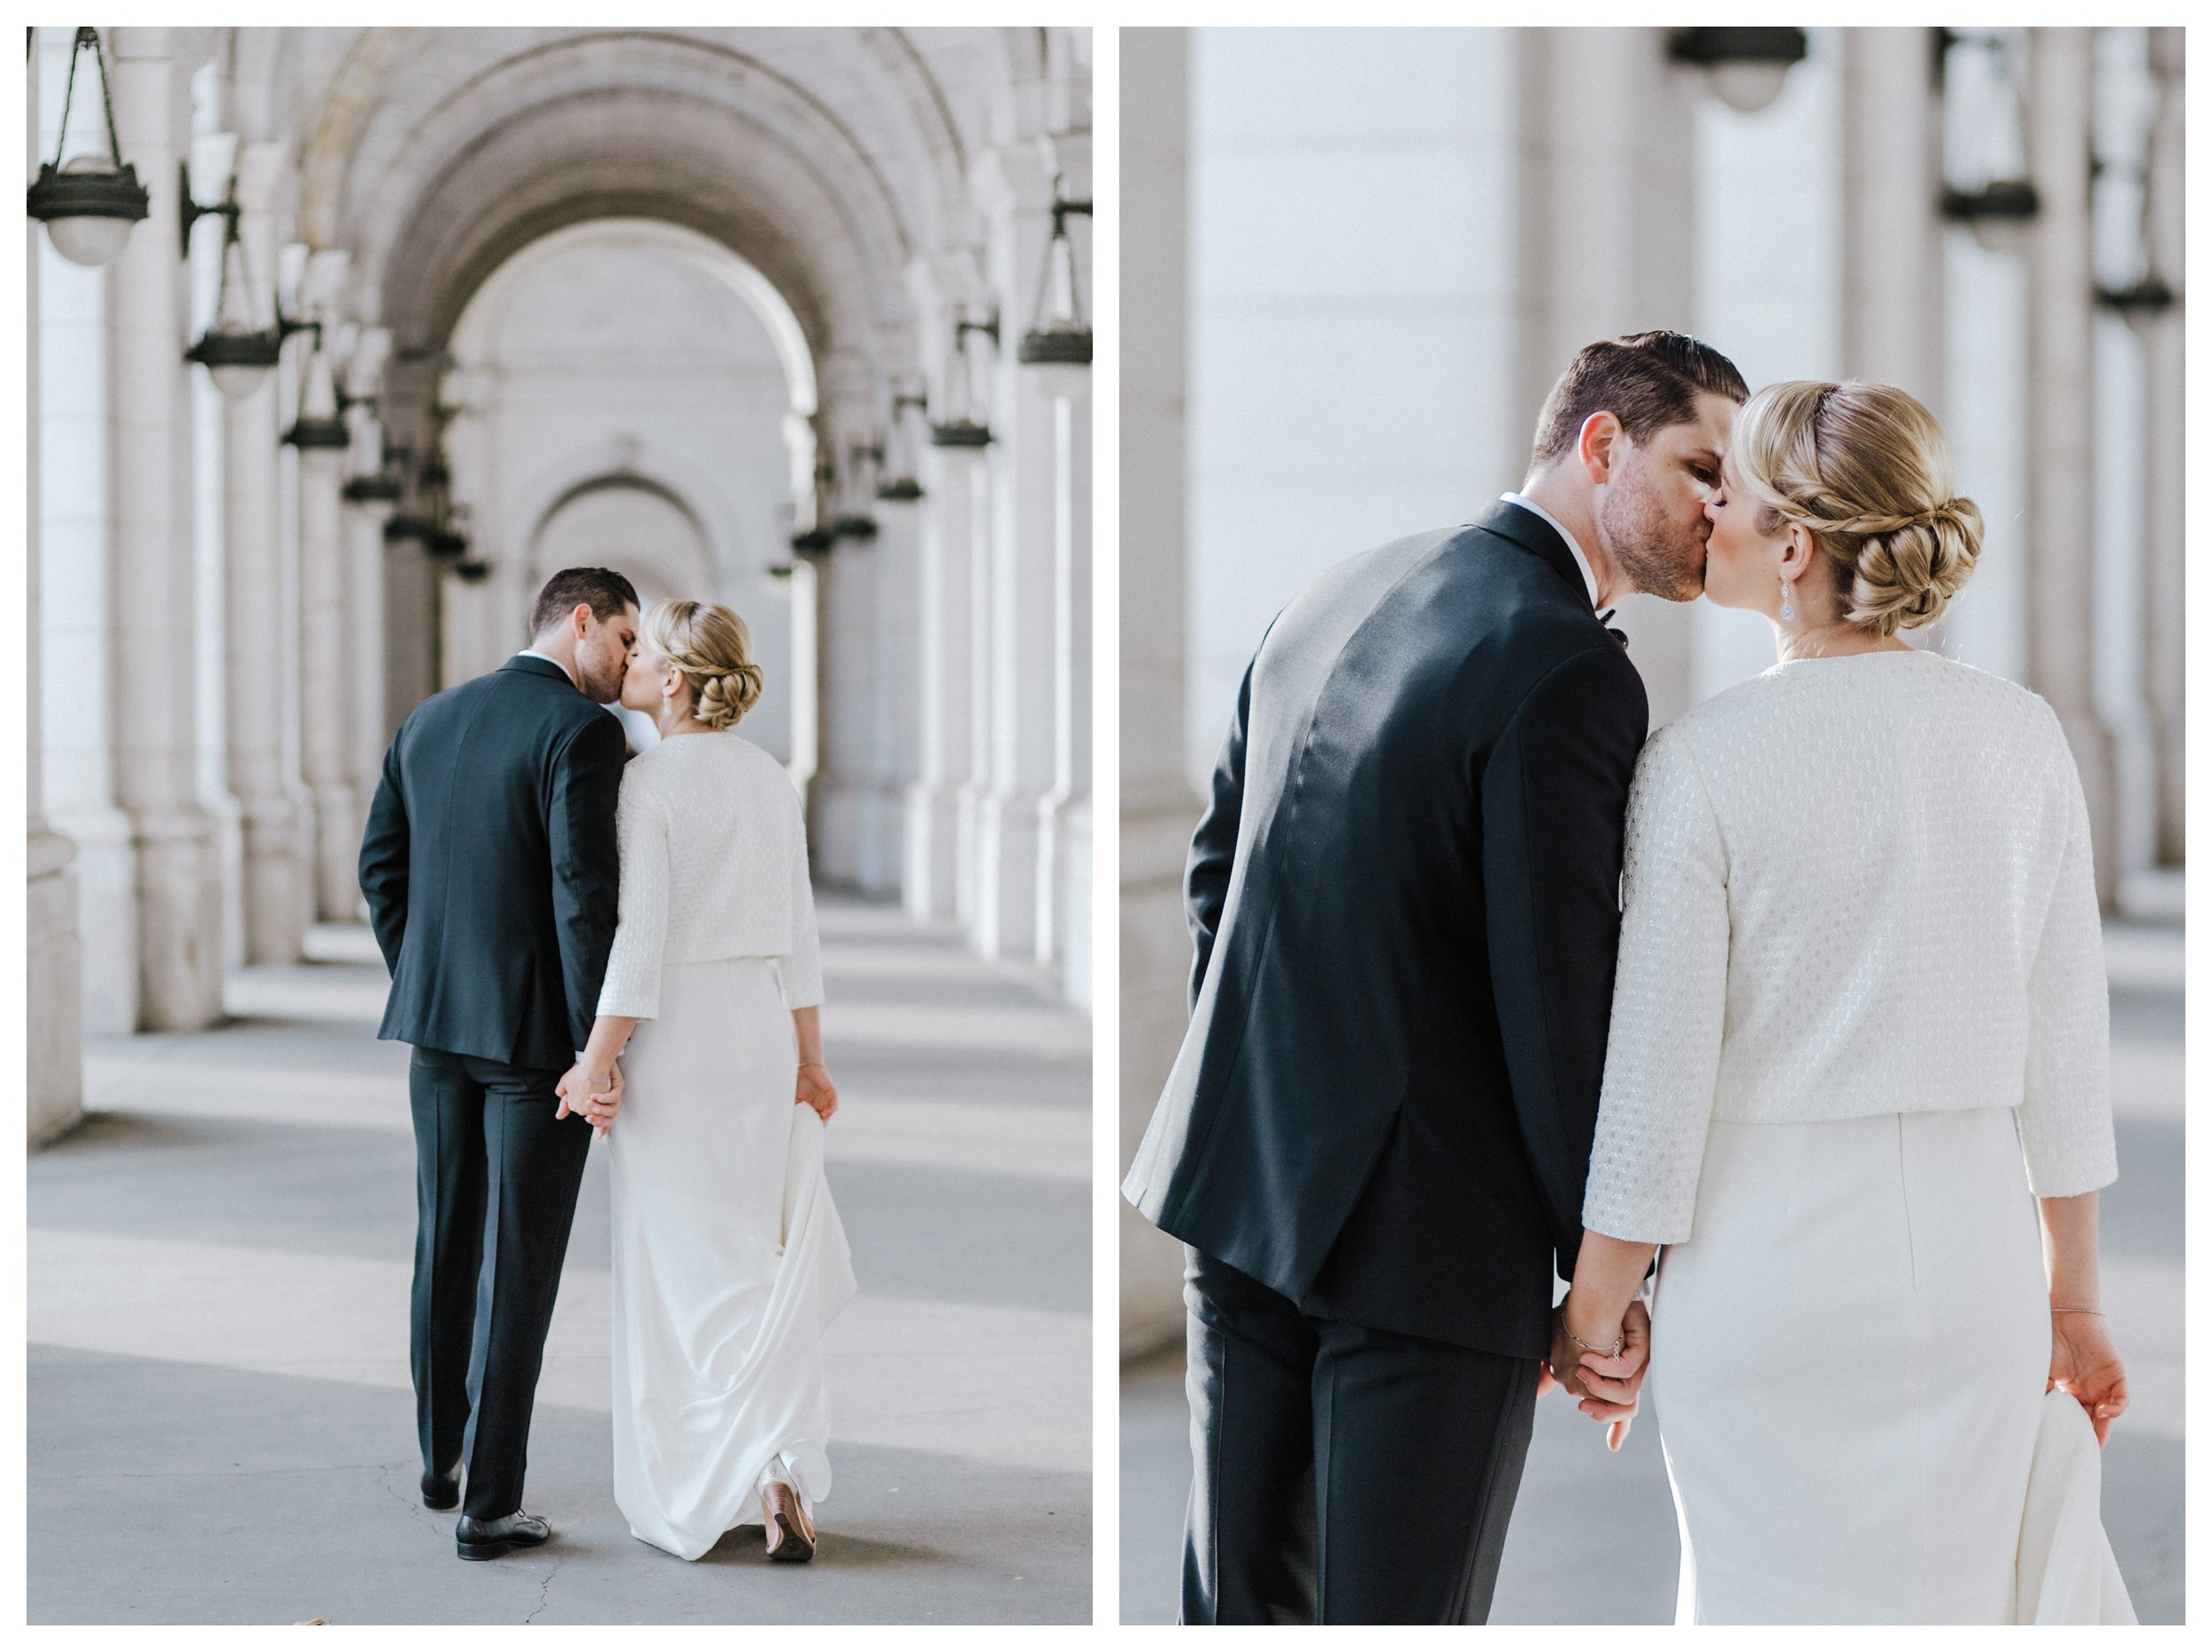 washington-dc-wedding-photographer-18.JPG